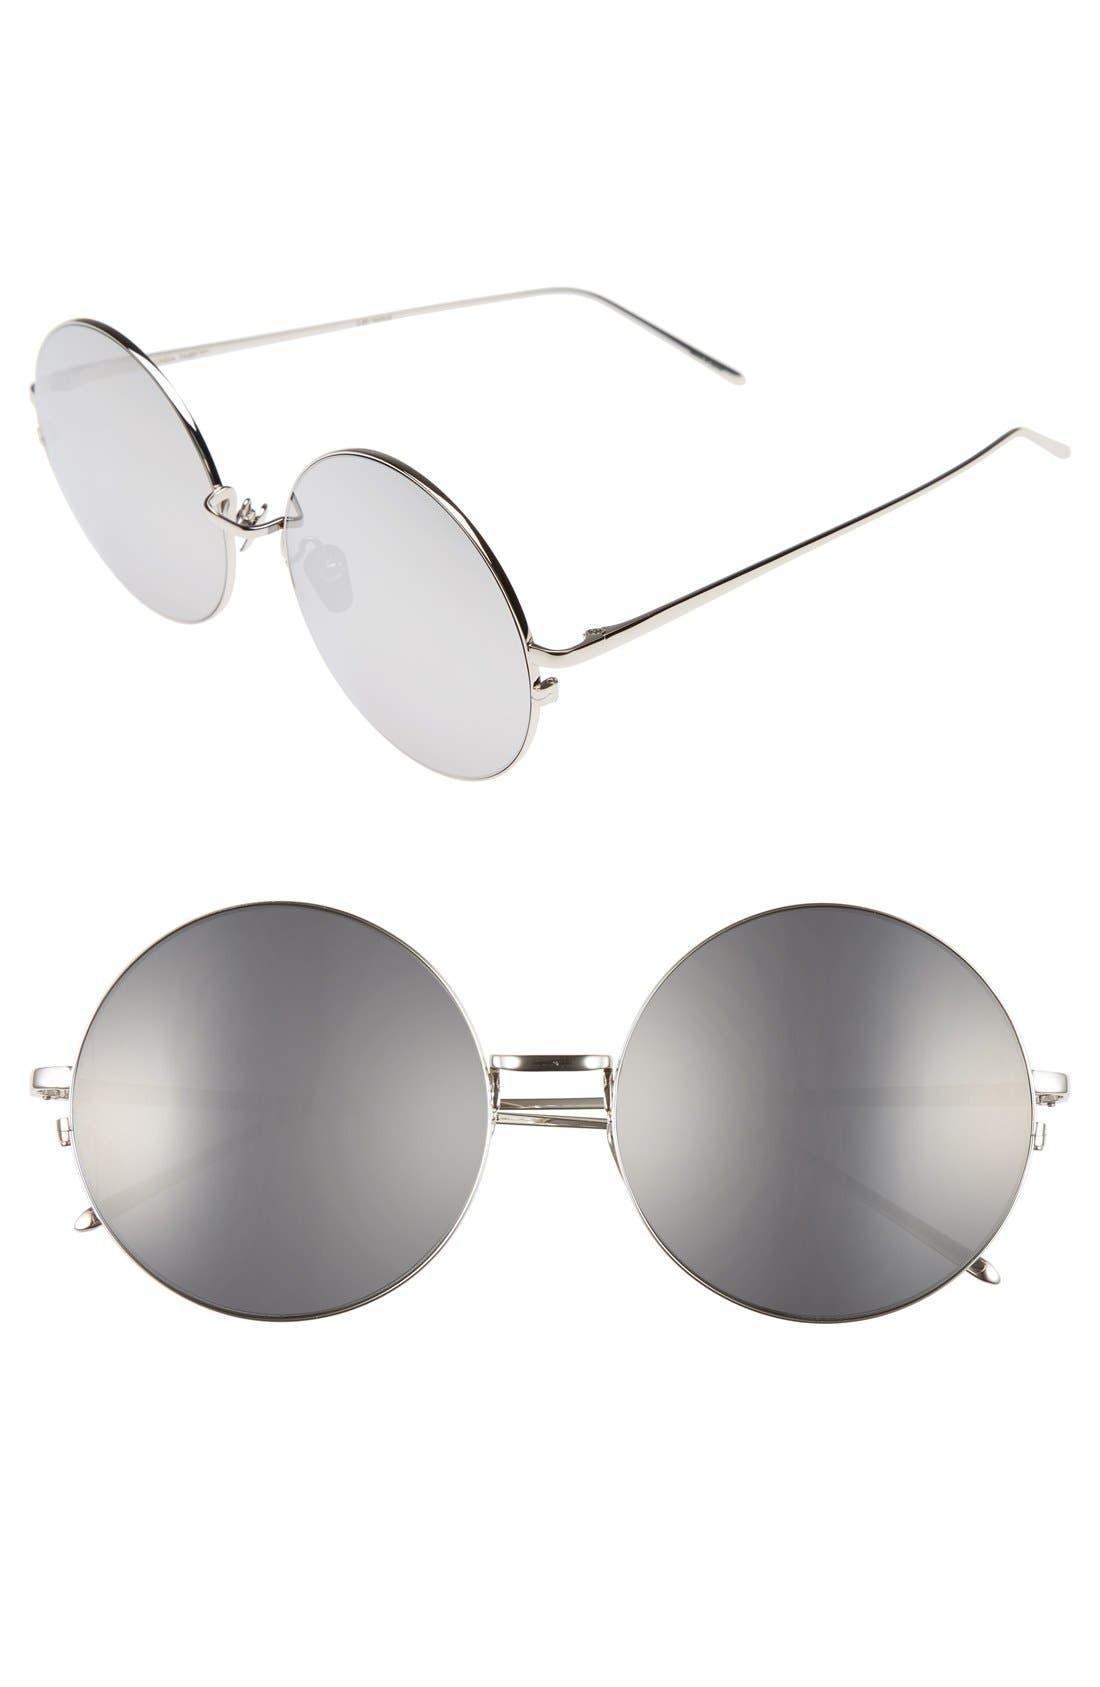 Linda Farrow 58mm Round 18 Karat White Gold Trim Sunglasses